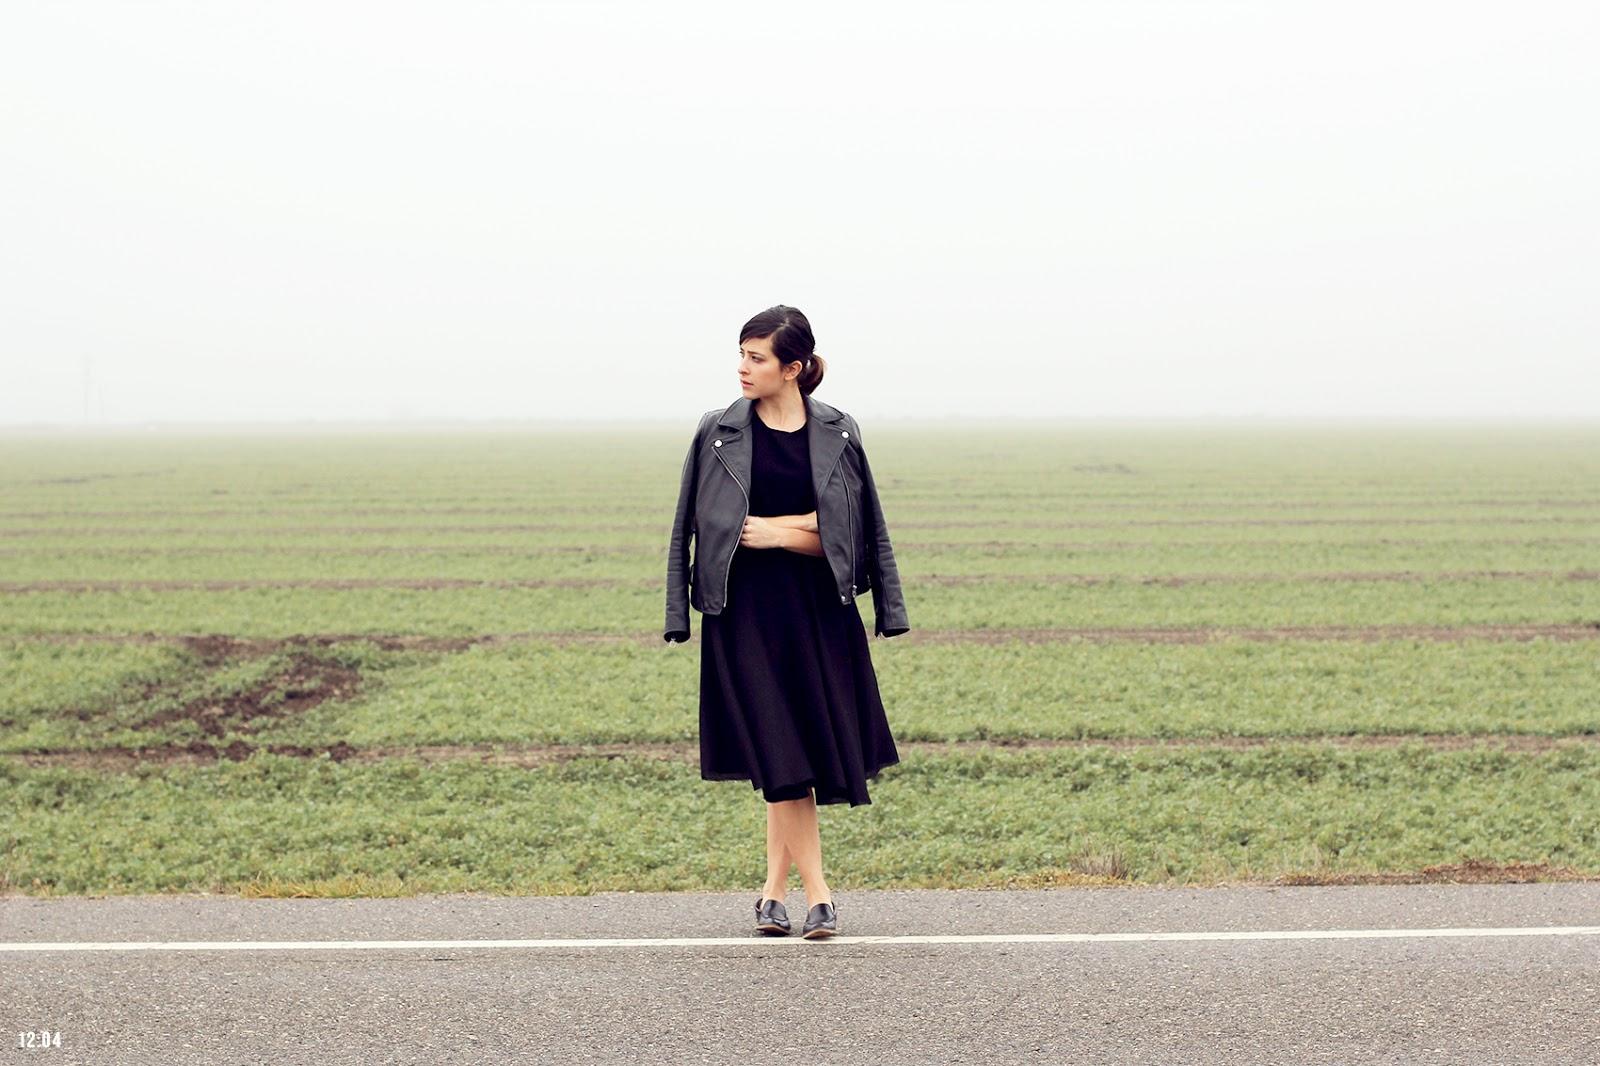 567-twelveofour-dixon-fog-all-black-yang-li-everlane-IMG_5752.jpg